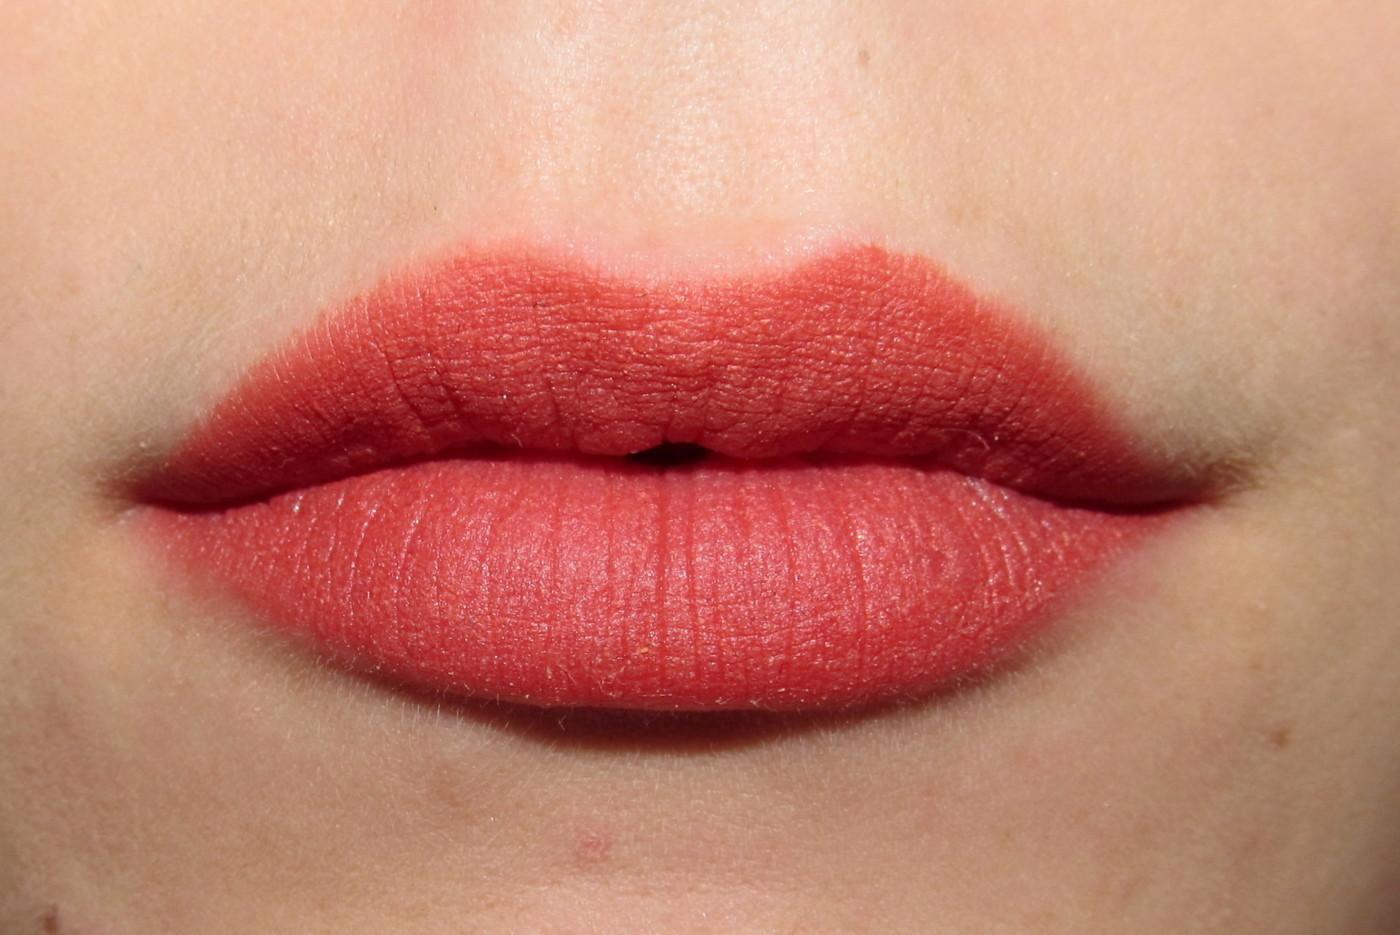 Messing Up My Pretty Lipstick